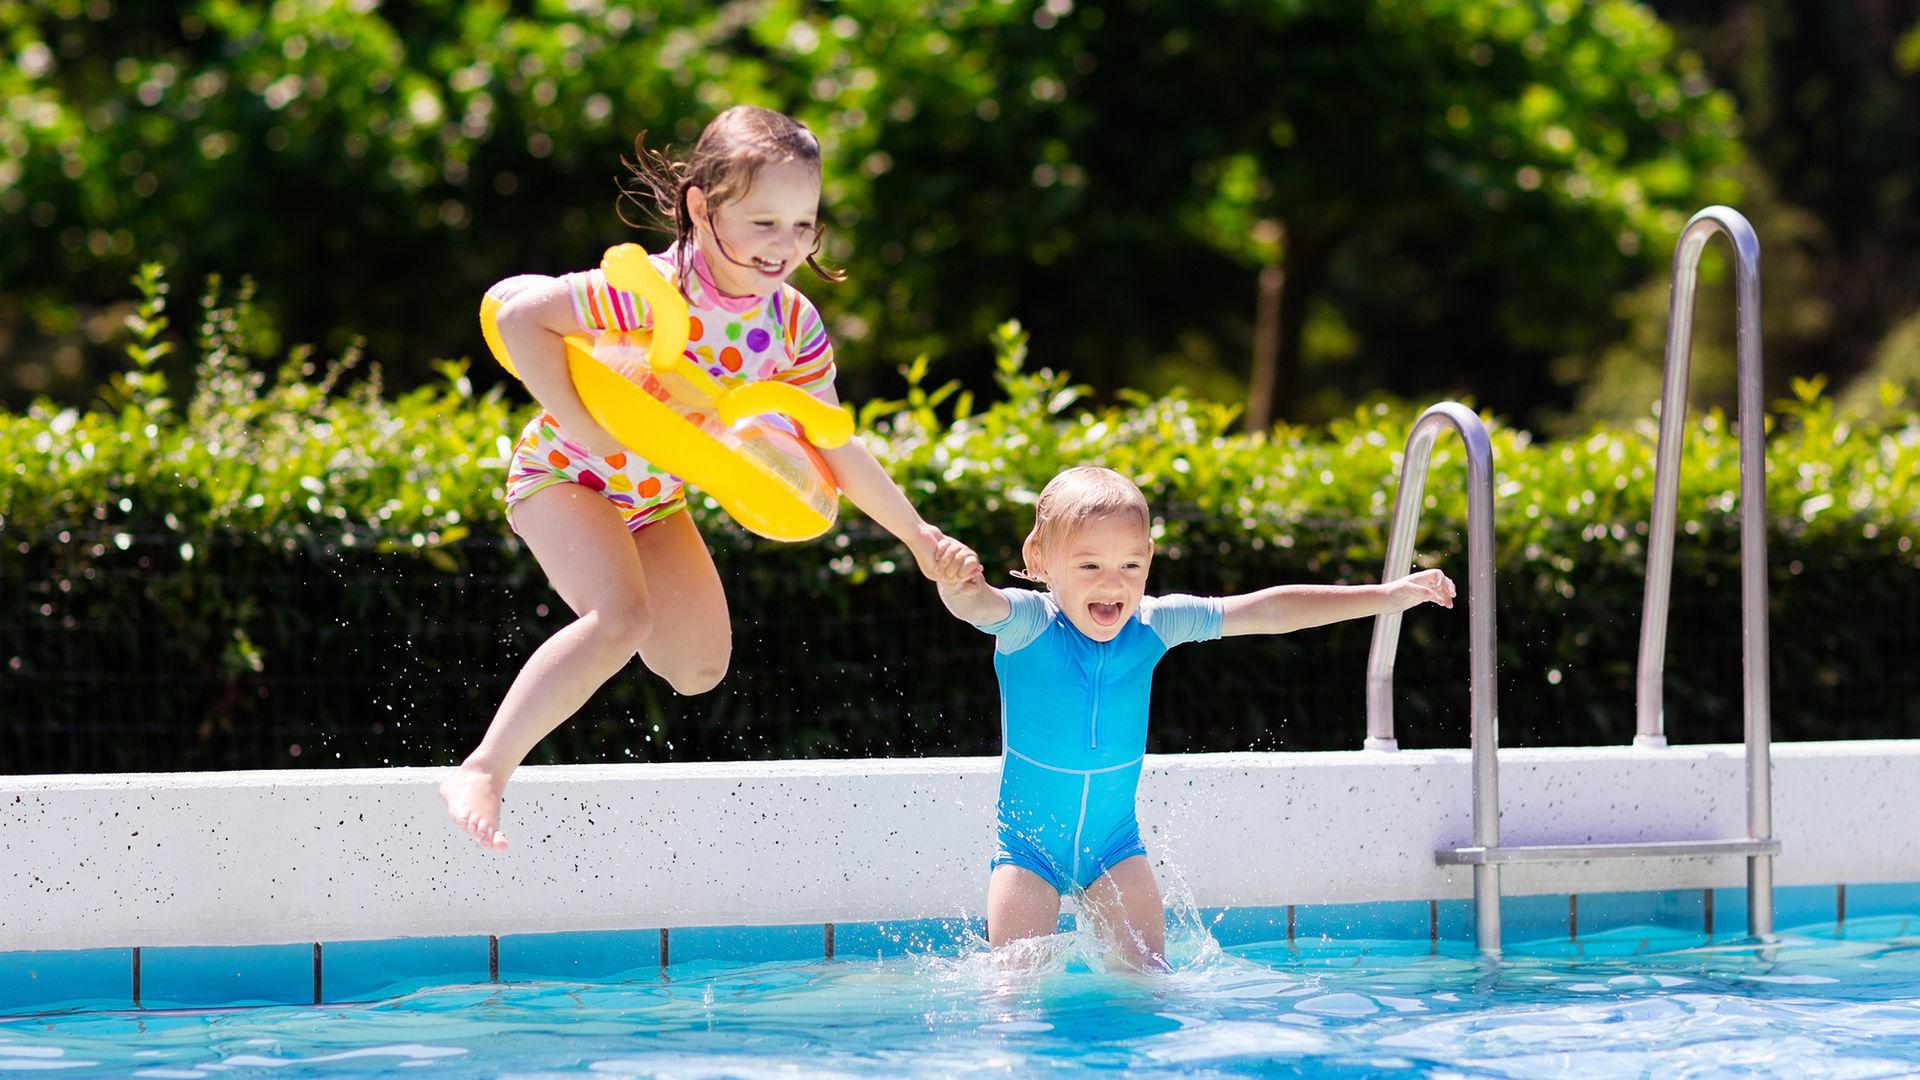 Children Jumping In Pool Poolio Image.jp